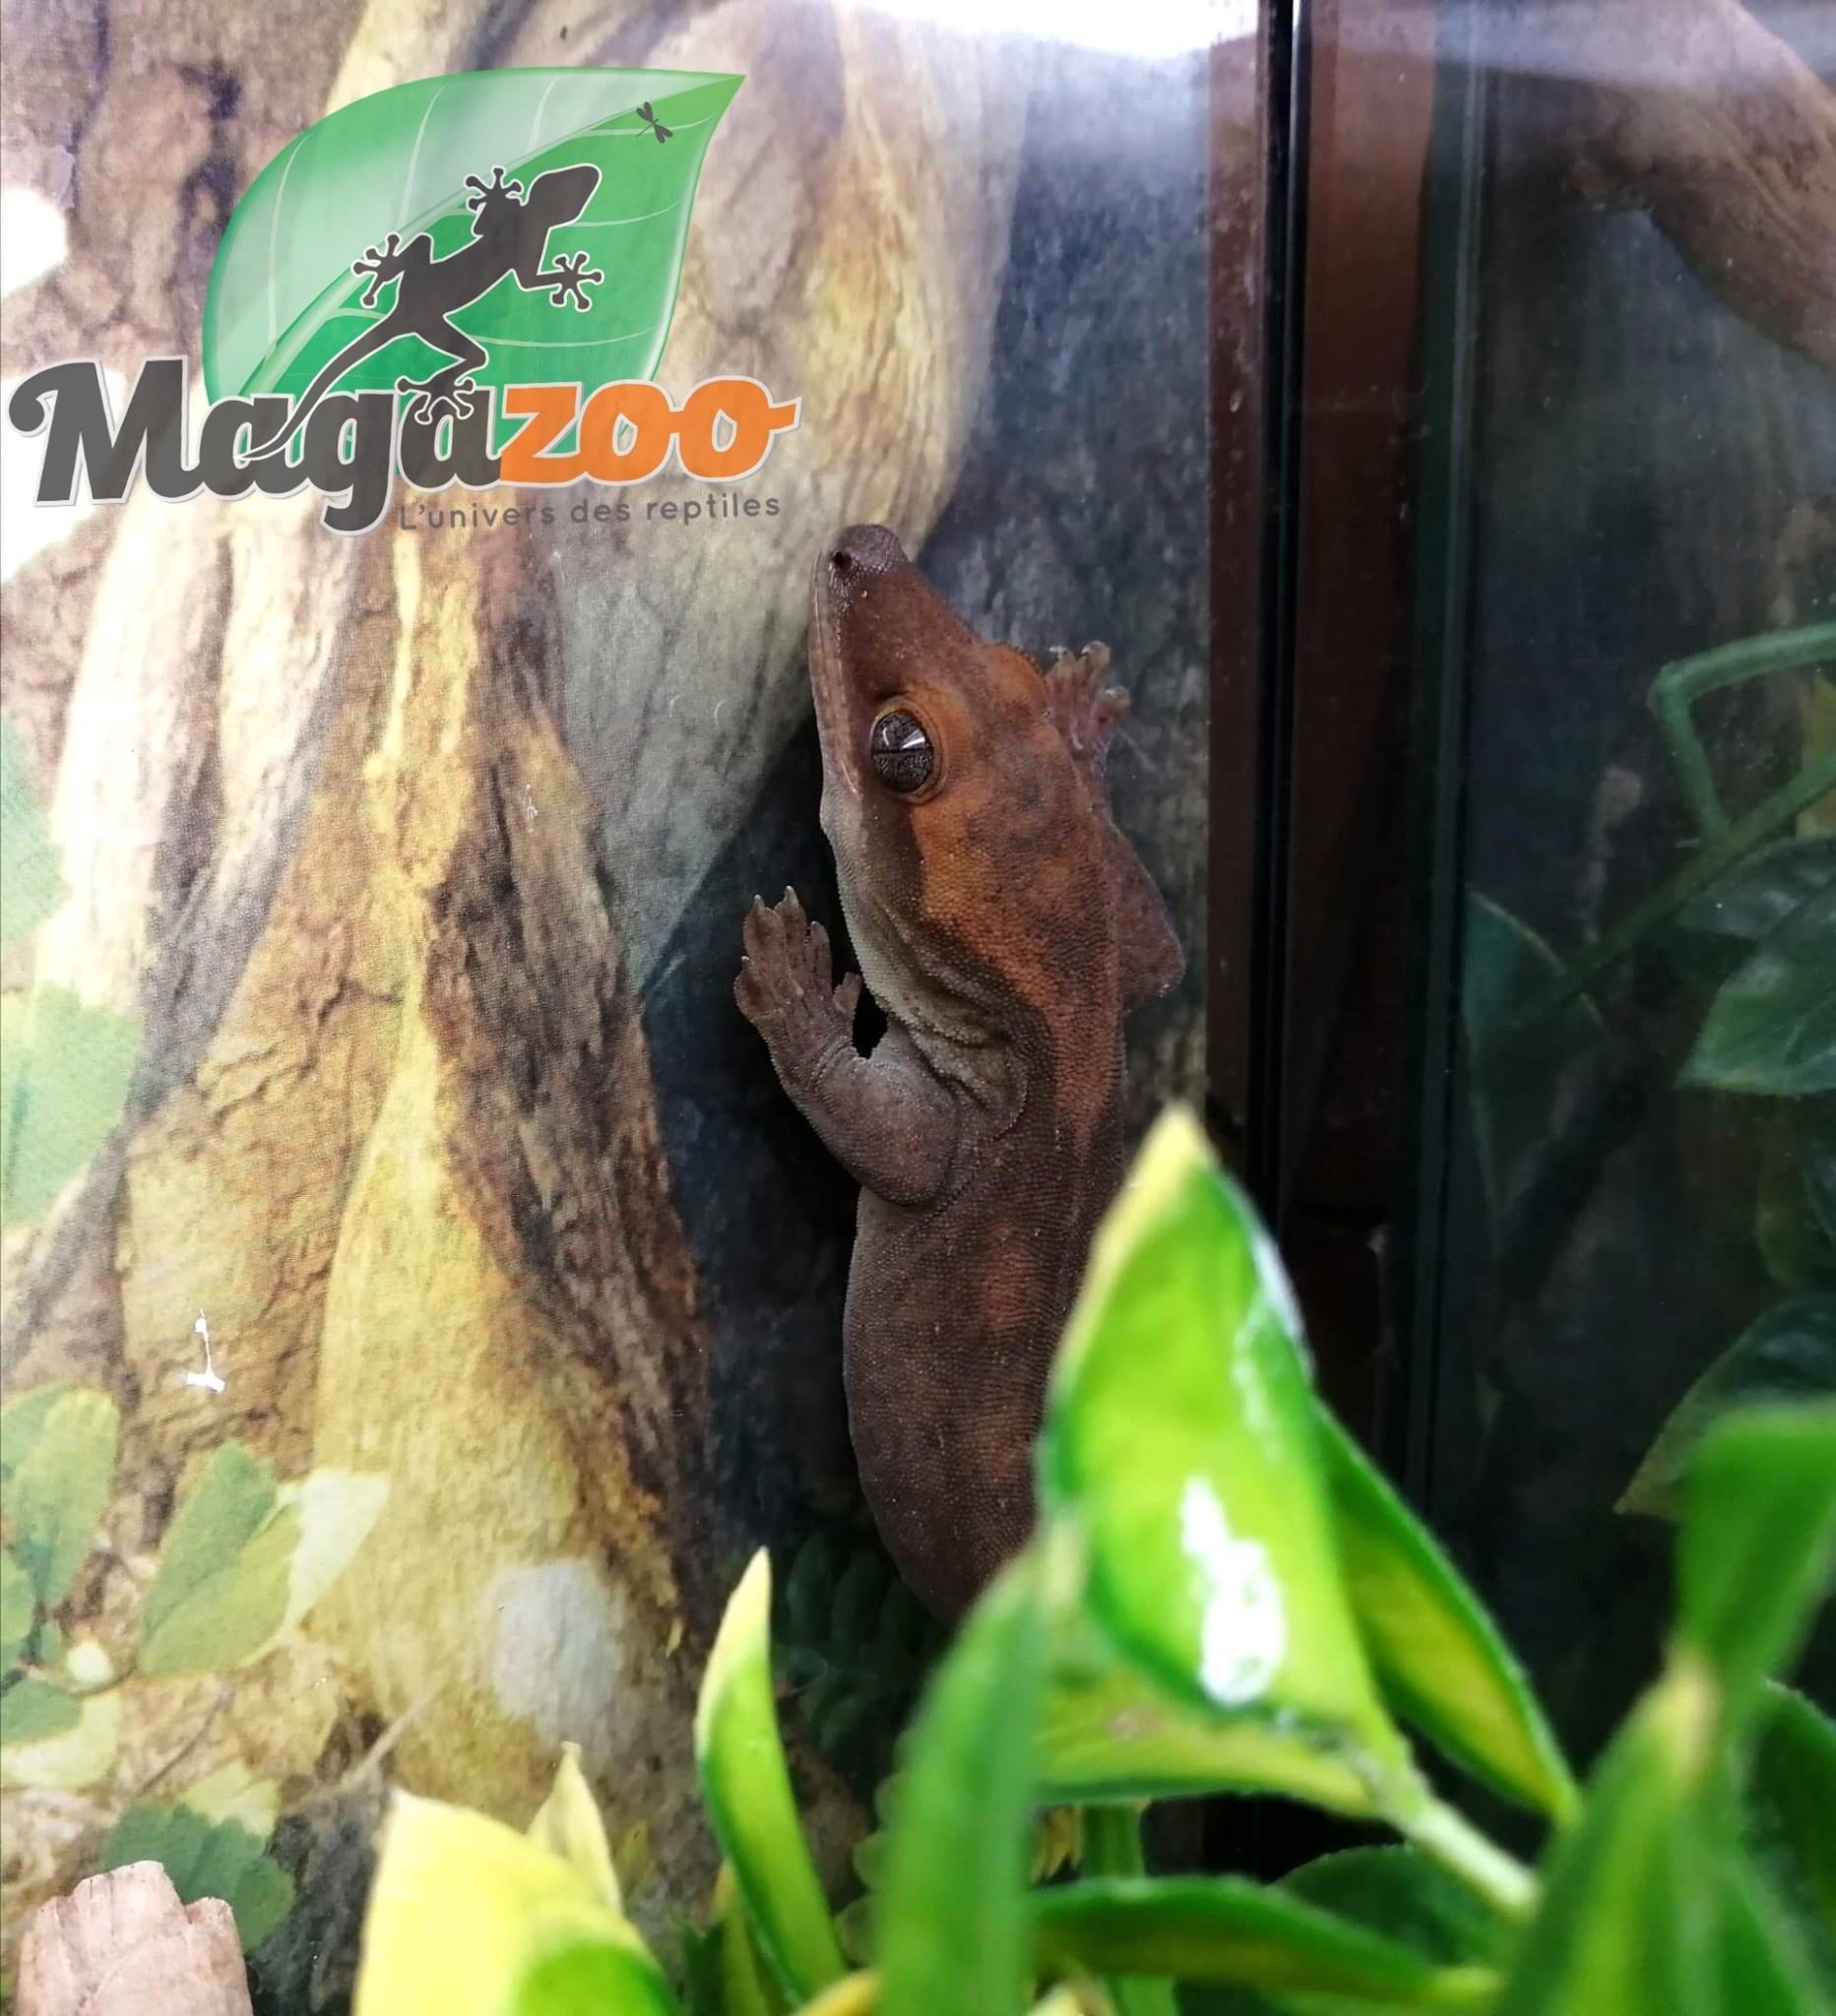 Magazoo Gecko à queue préhensile Sarasinorum mâle (queue couper)